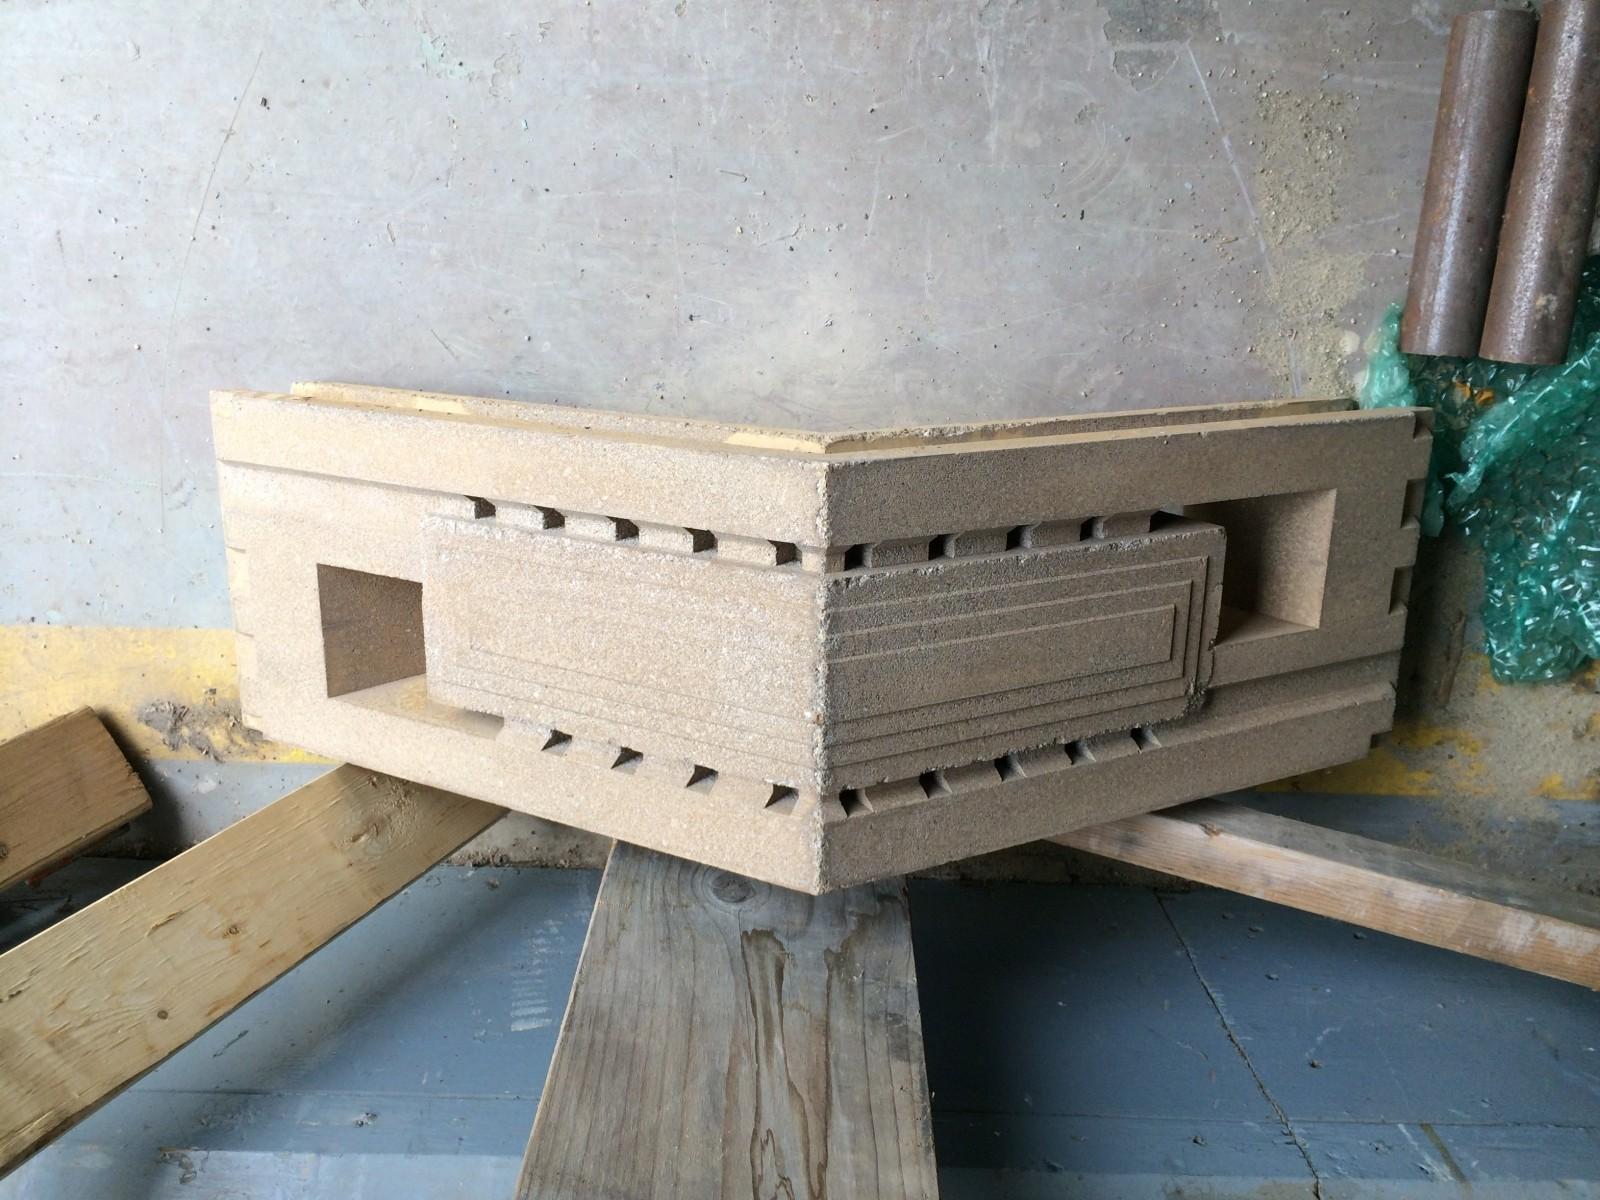 Una prueba inicial de un típico bloque de esquina para utilizar en la capilla. Imagen © Mesick Cohen Wilson Baker Architects (MCWB)